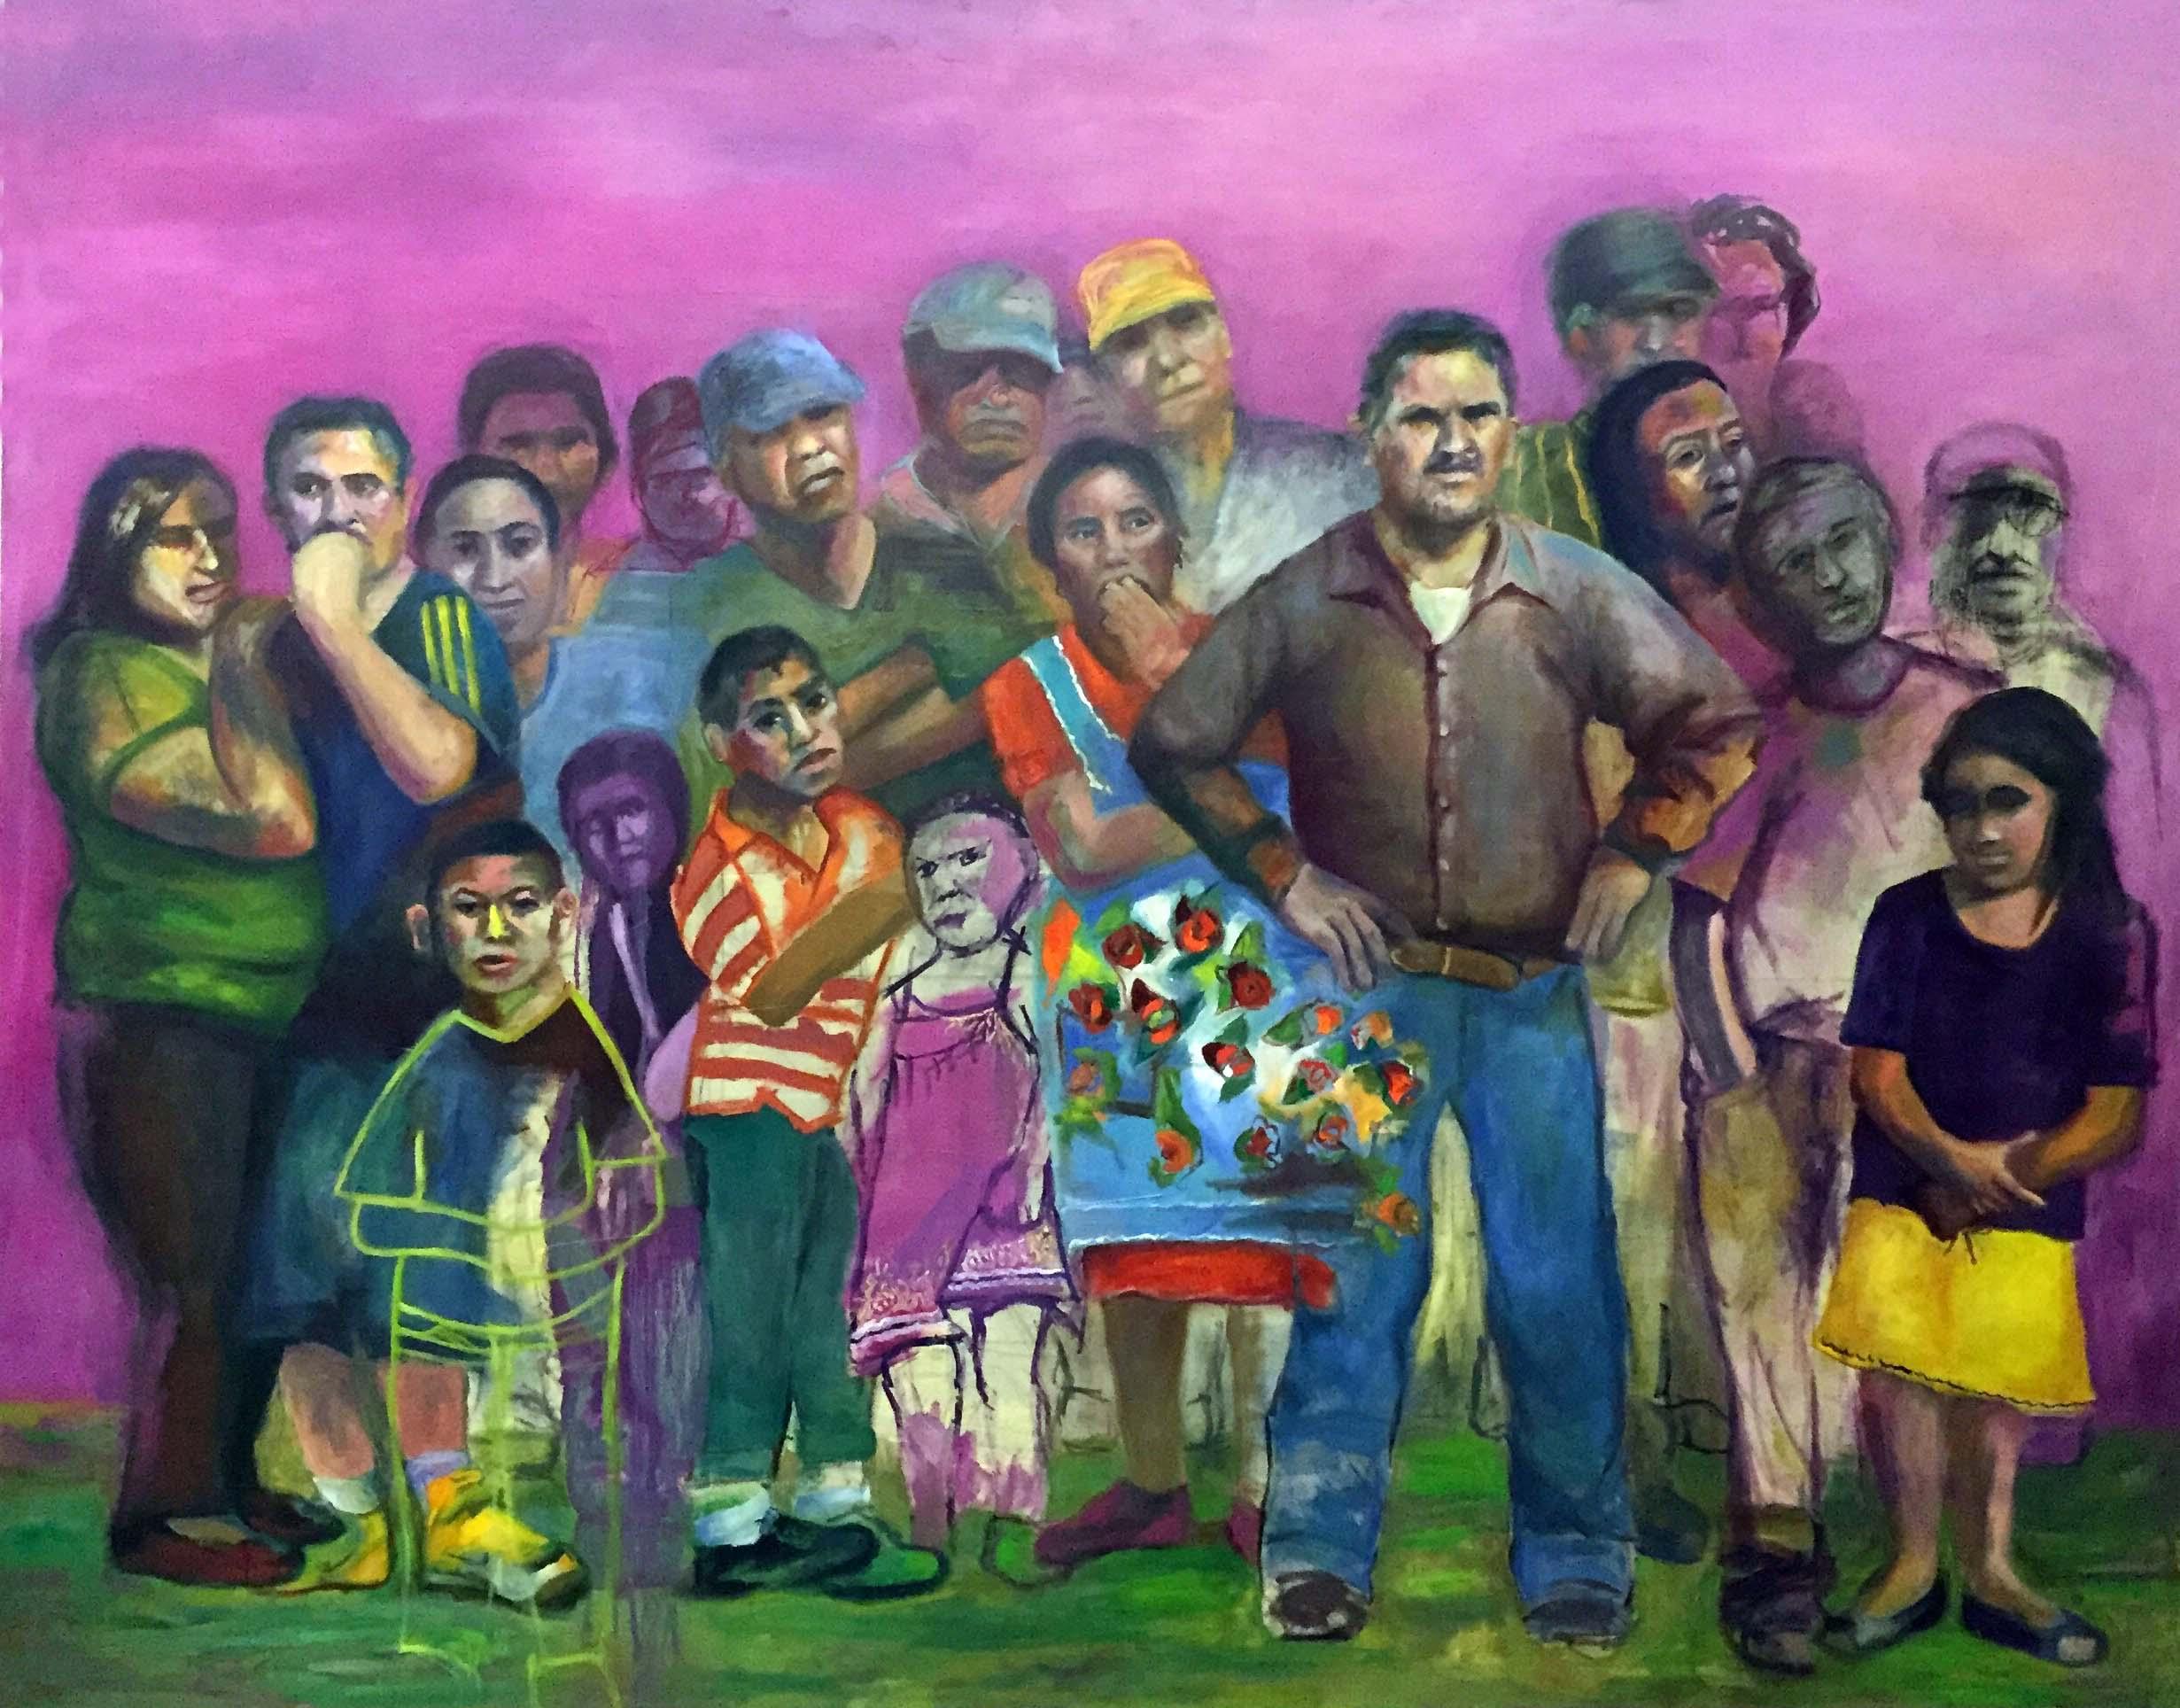 Crowd by Jessica Alazraki, 2016, Oil on Canvas, 72x690 inches, for sale